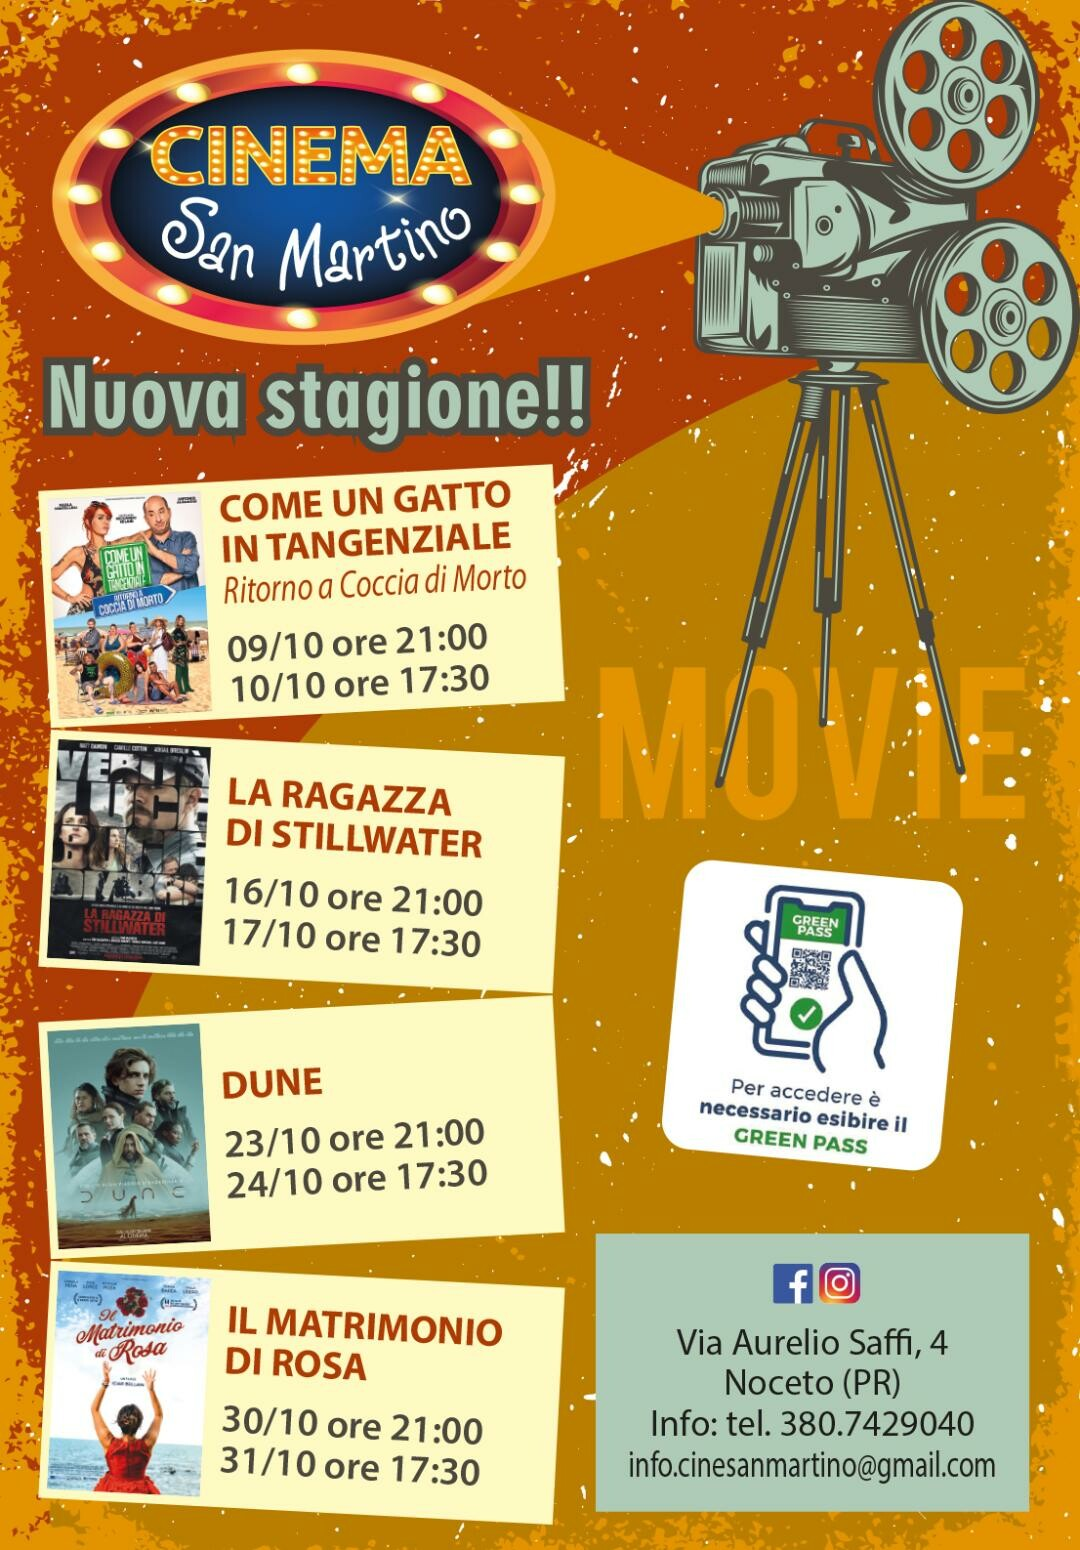 Programma ottobre cinema San Martino a Noceto